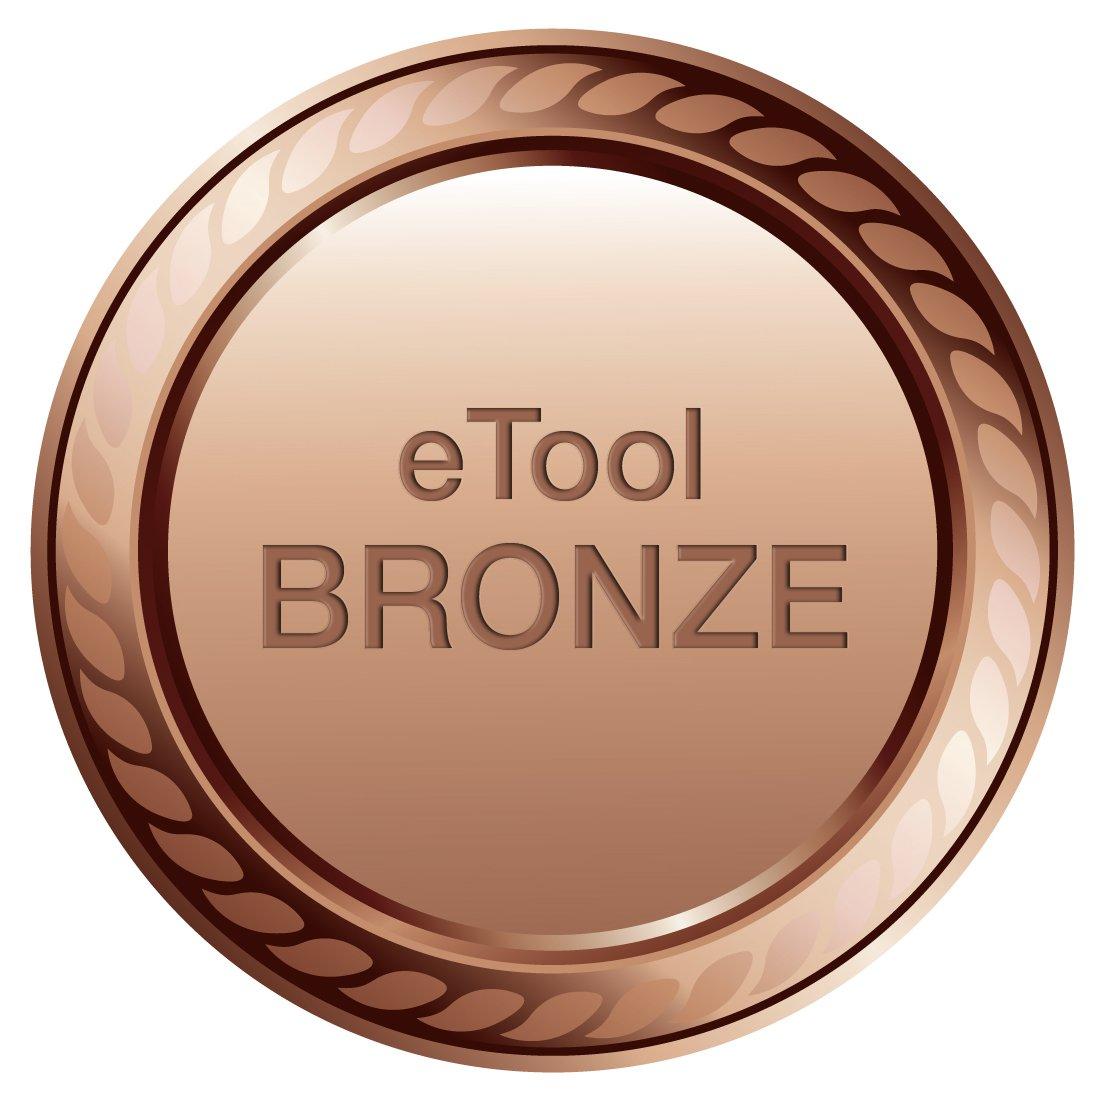 etool_bronze_medal